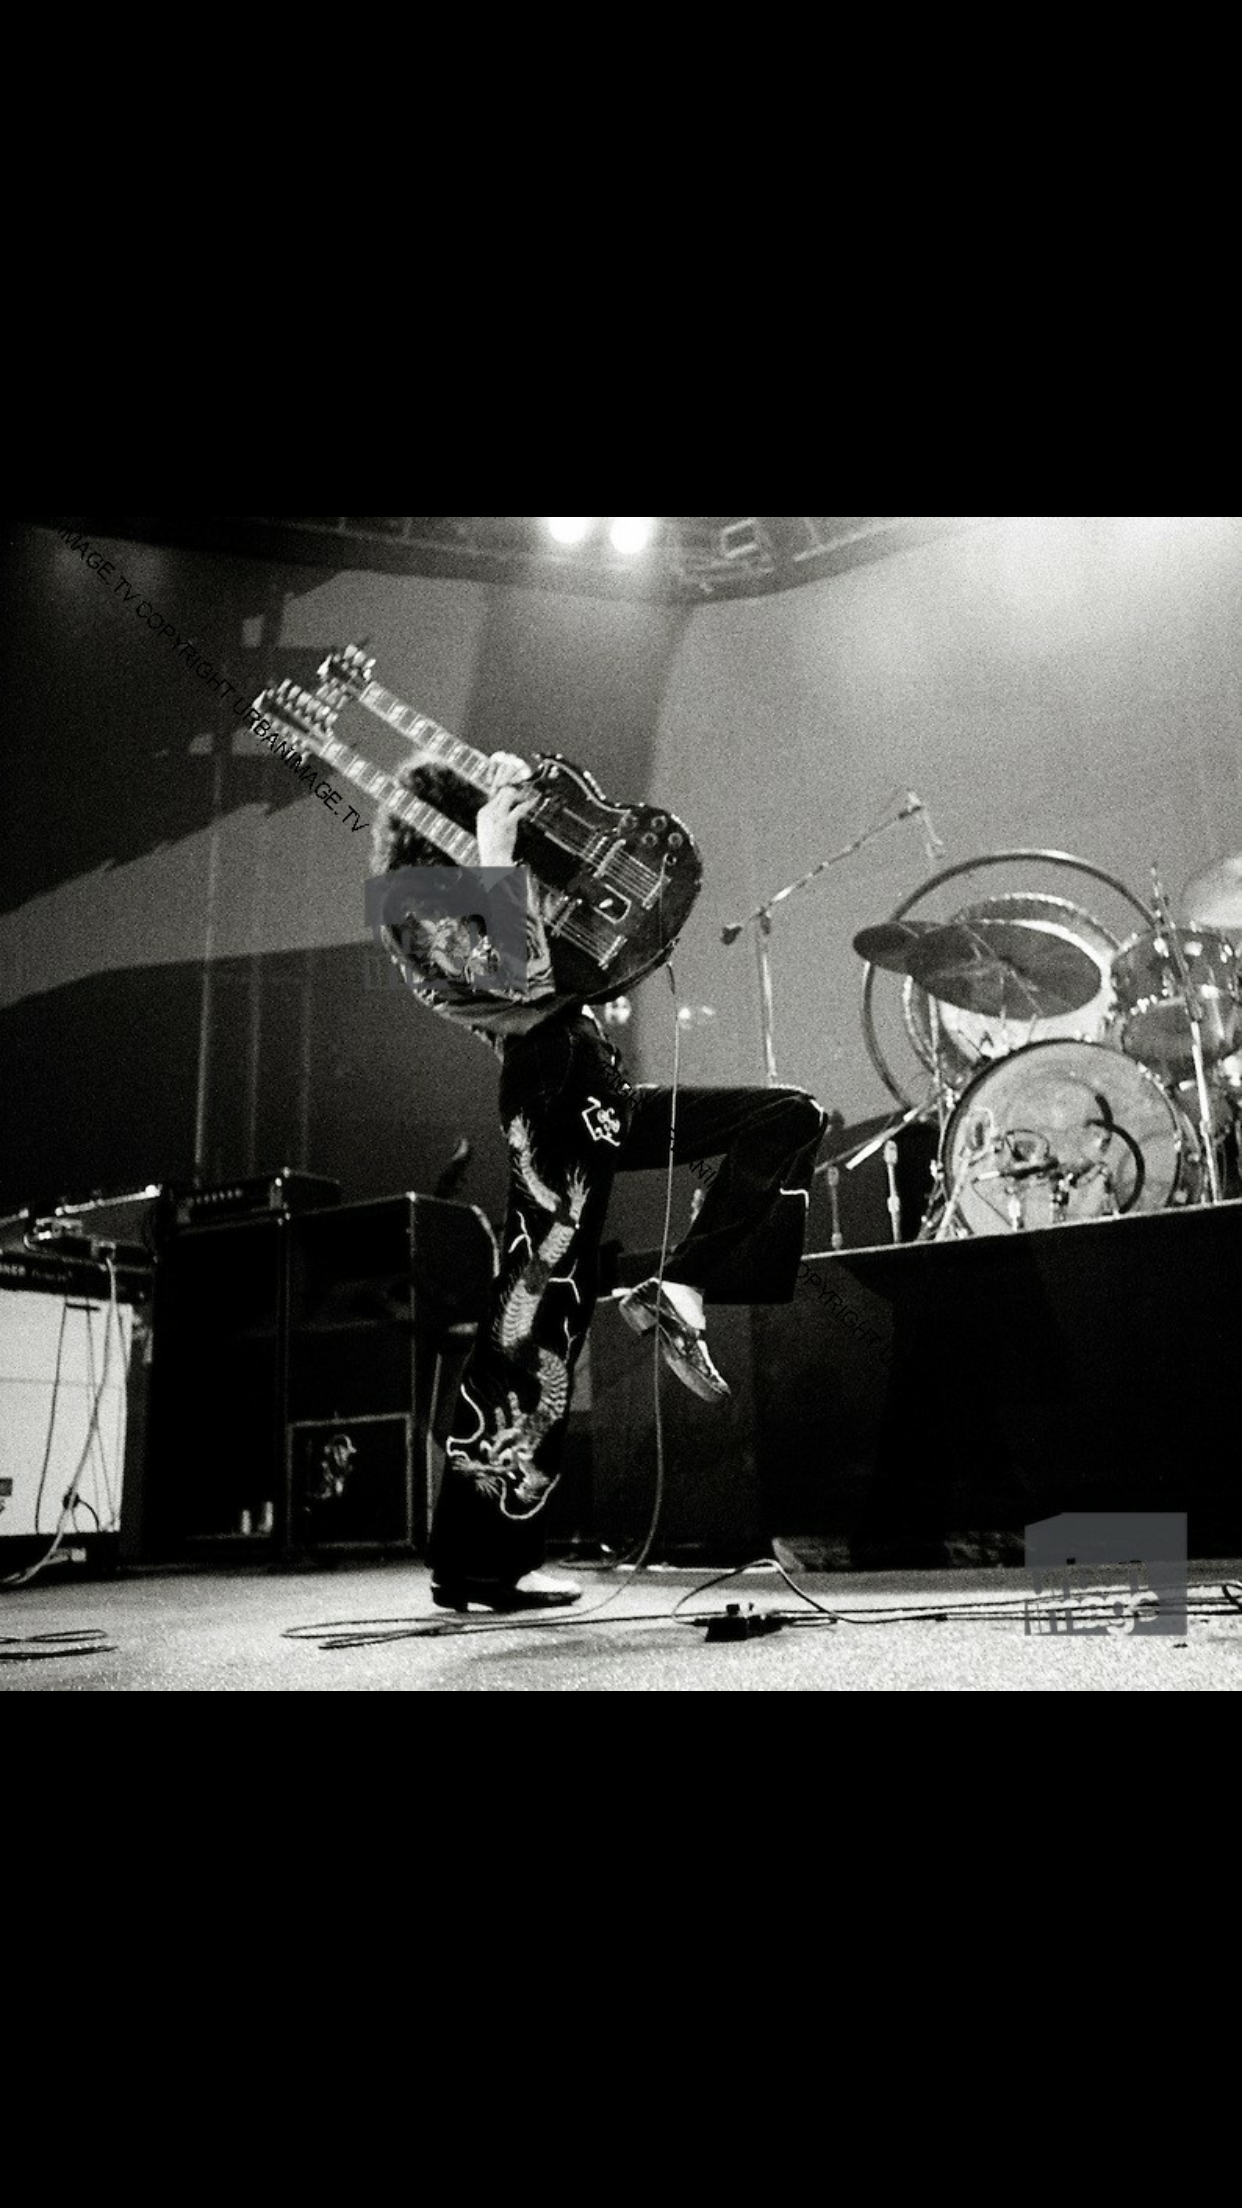 Pin By 724 757 2303 On Led Zeppelin Led Zeppelin Live Zeppelin Led Zeppelin